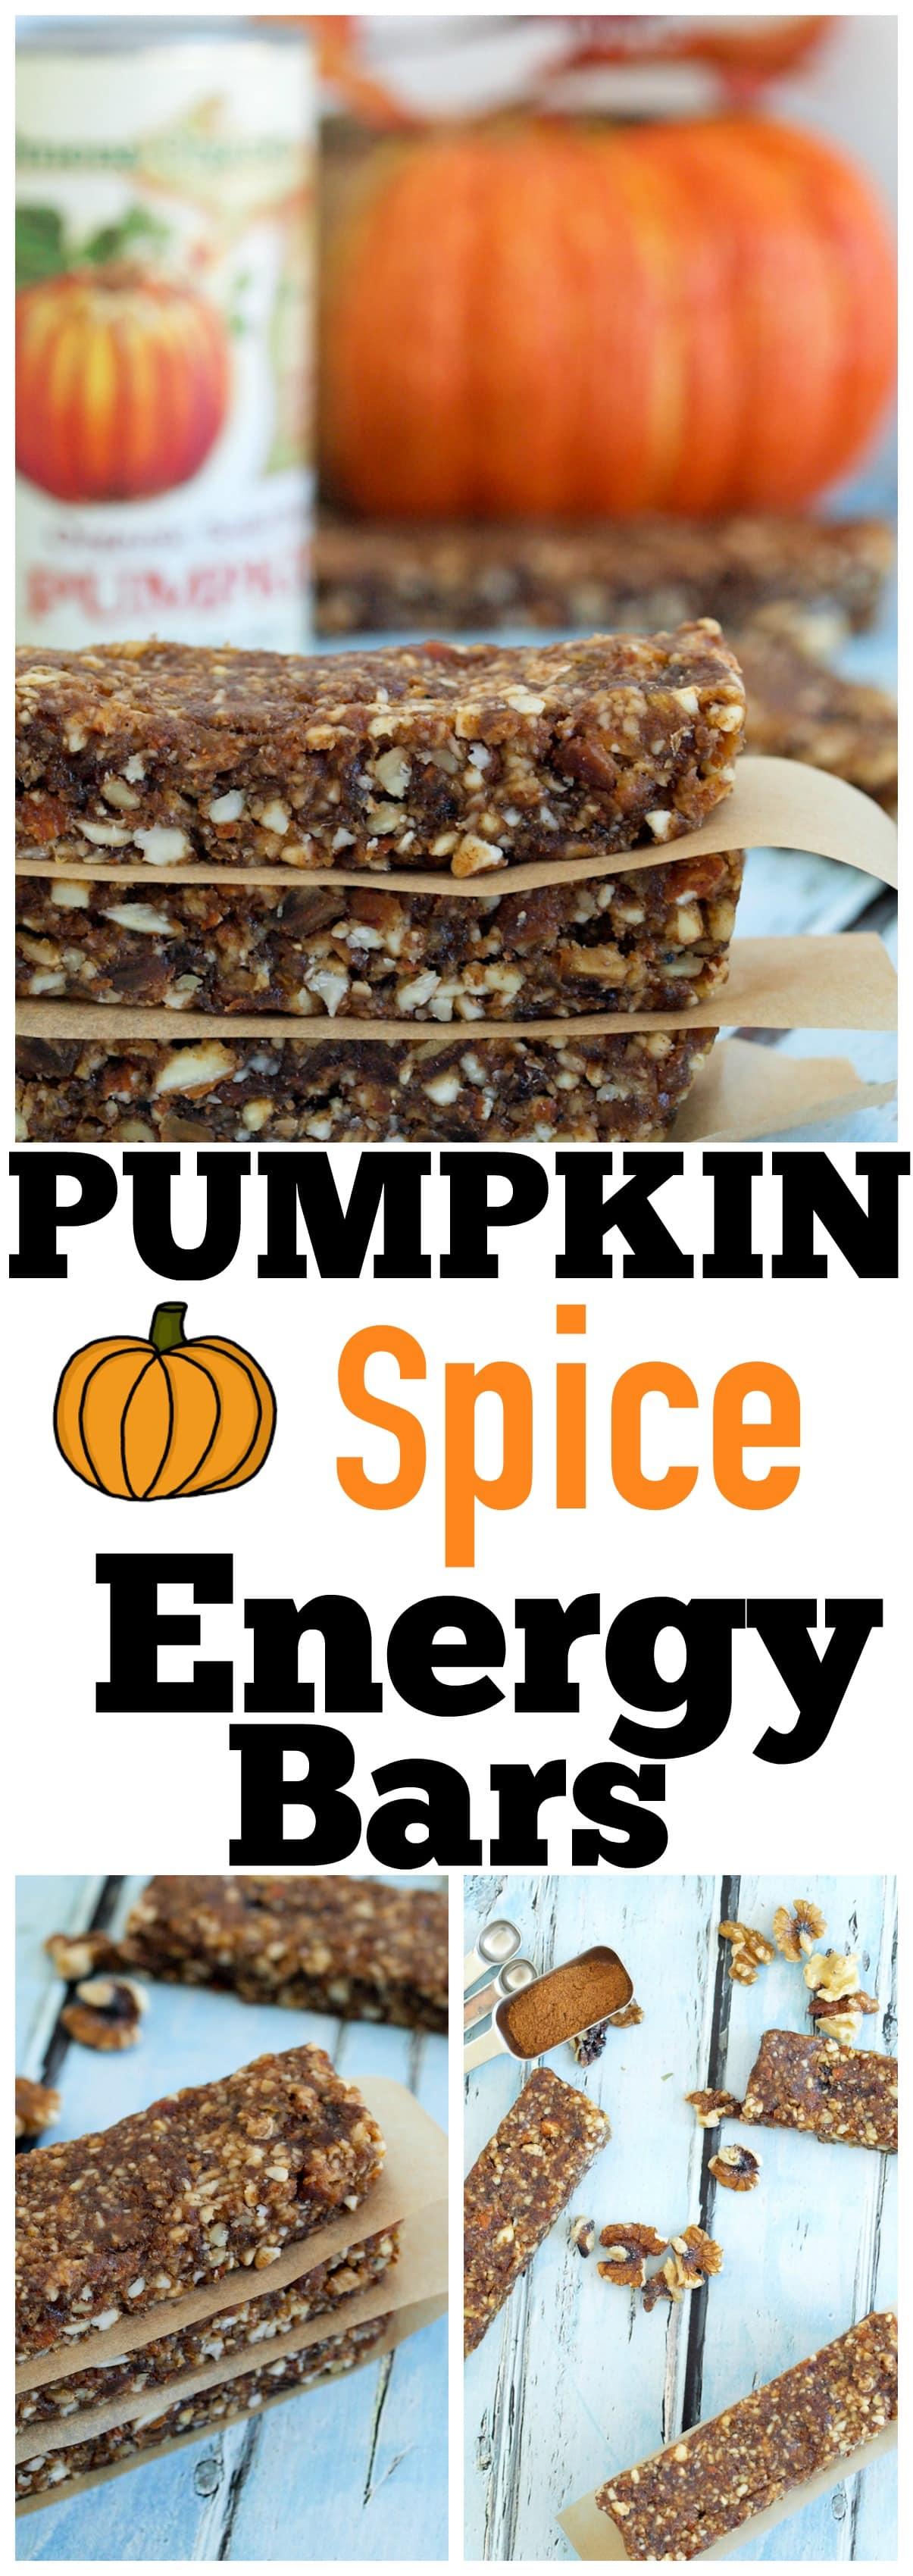 No Bake Pumpkin Spice energy bar recipe. healthy gluten-free snack ideas